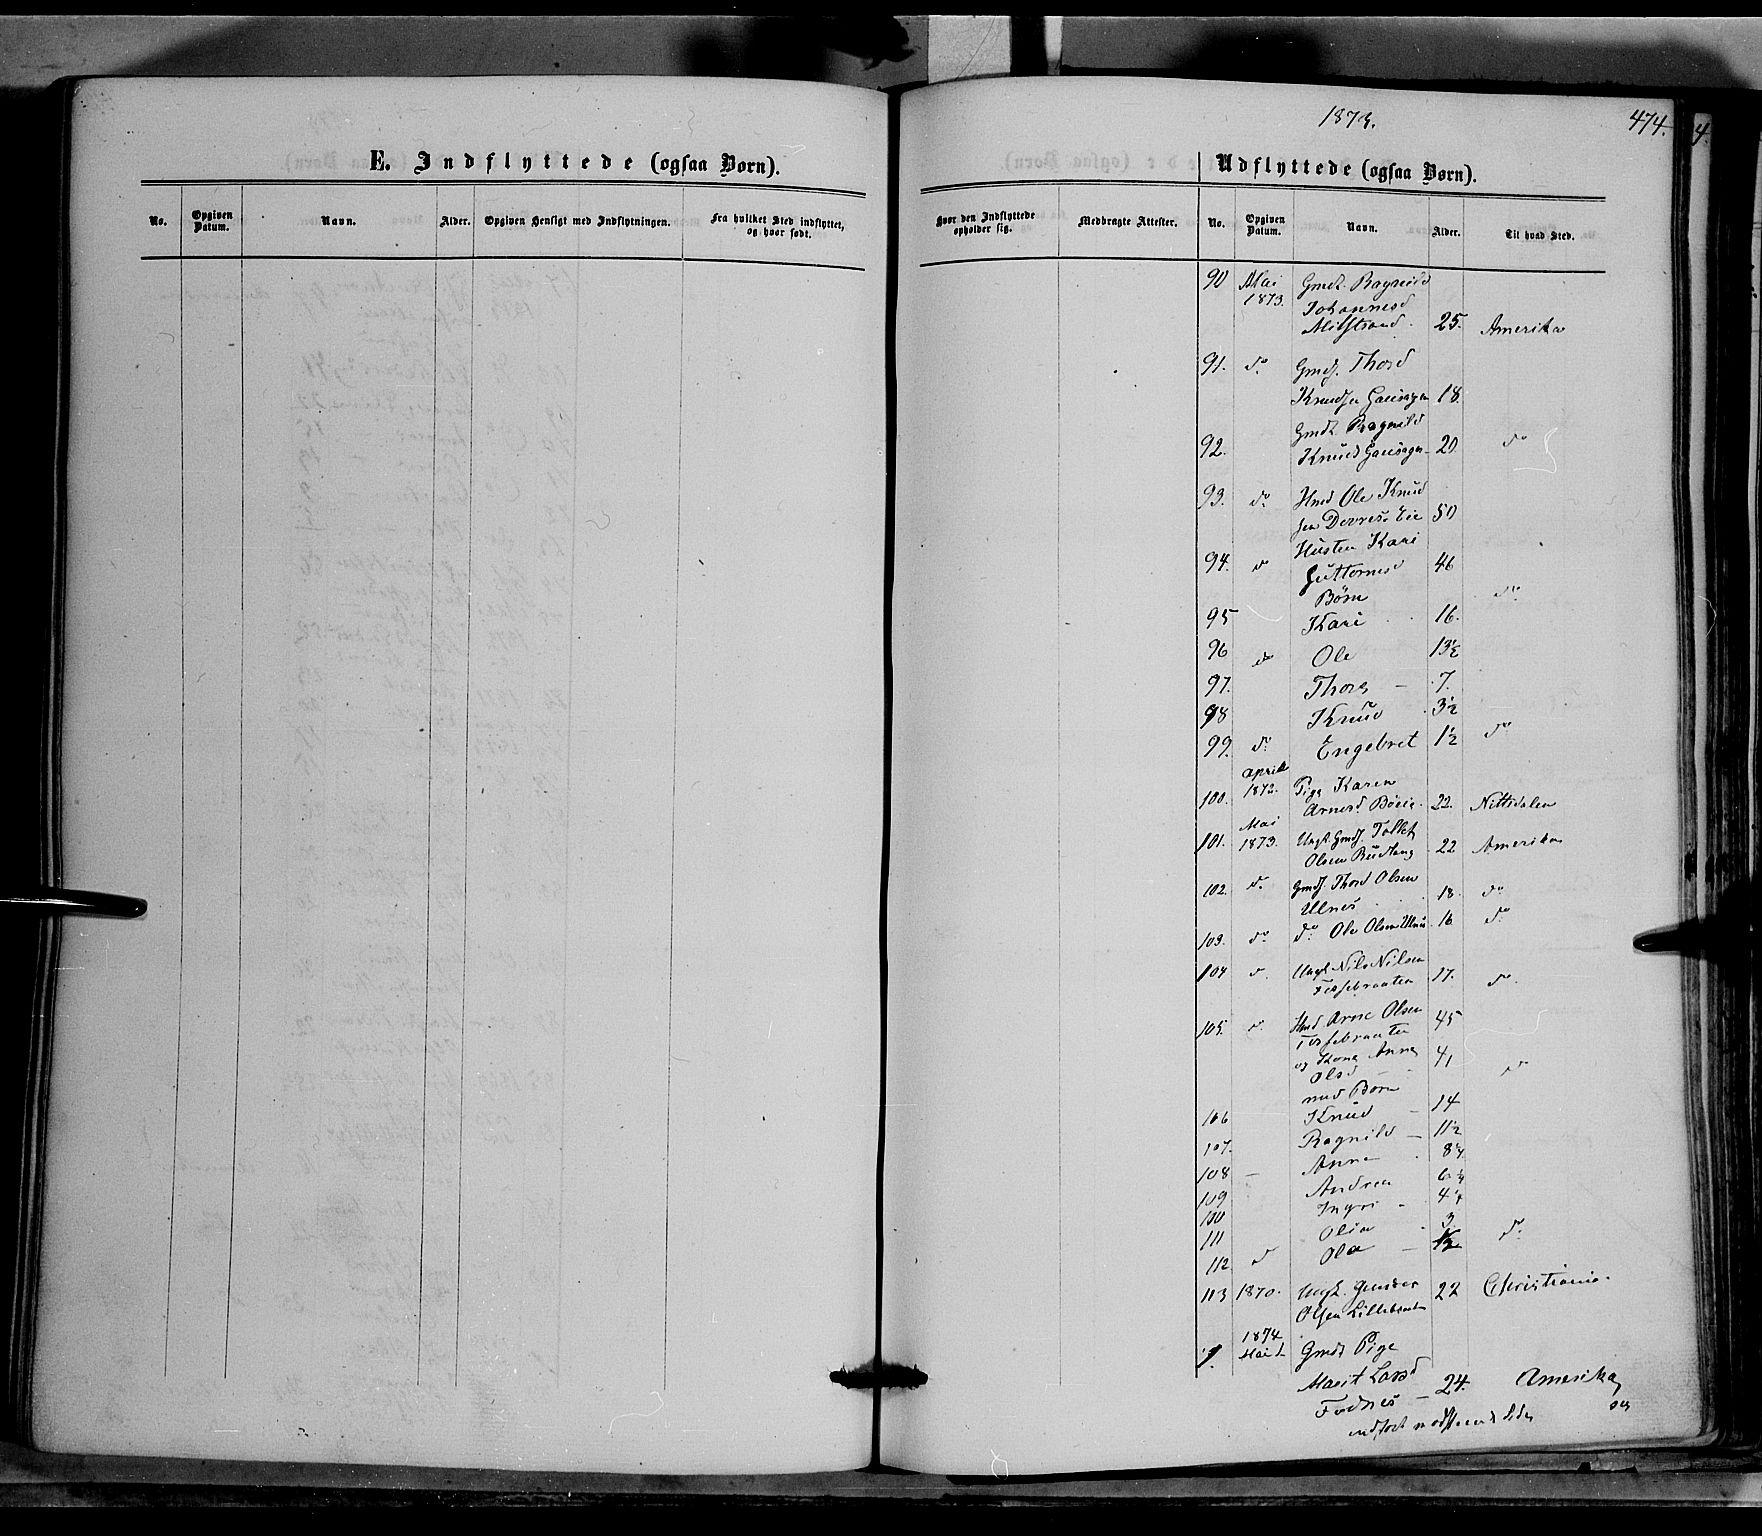 SAH, Nord-Aurdal prestekontor, Ministerialbok nr. 8, 1863-1875, s. 474